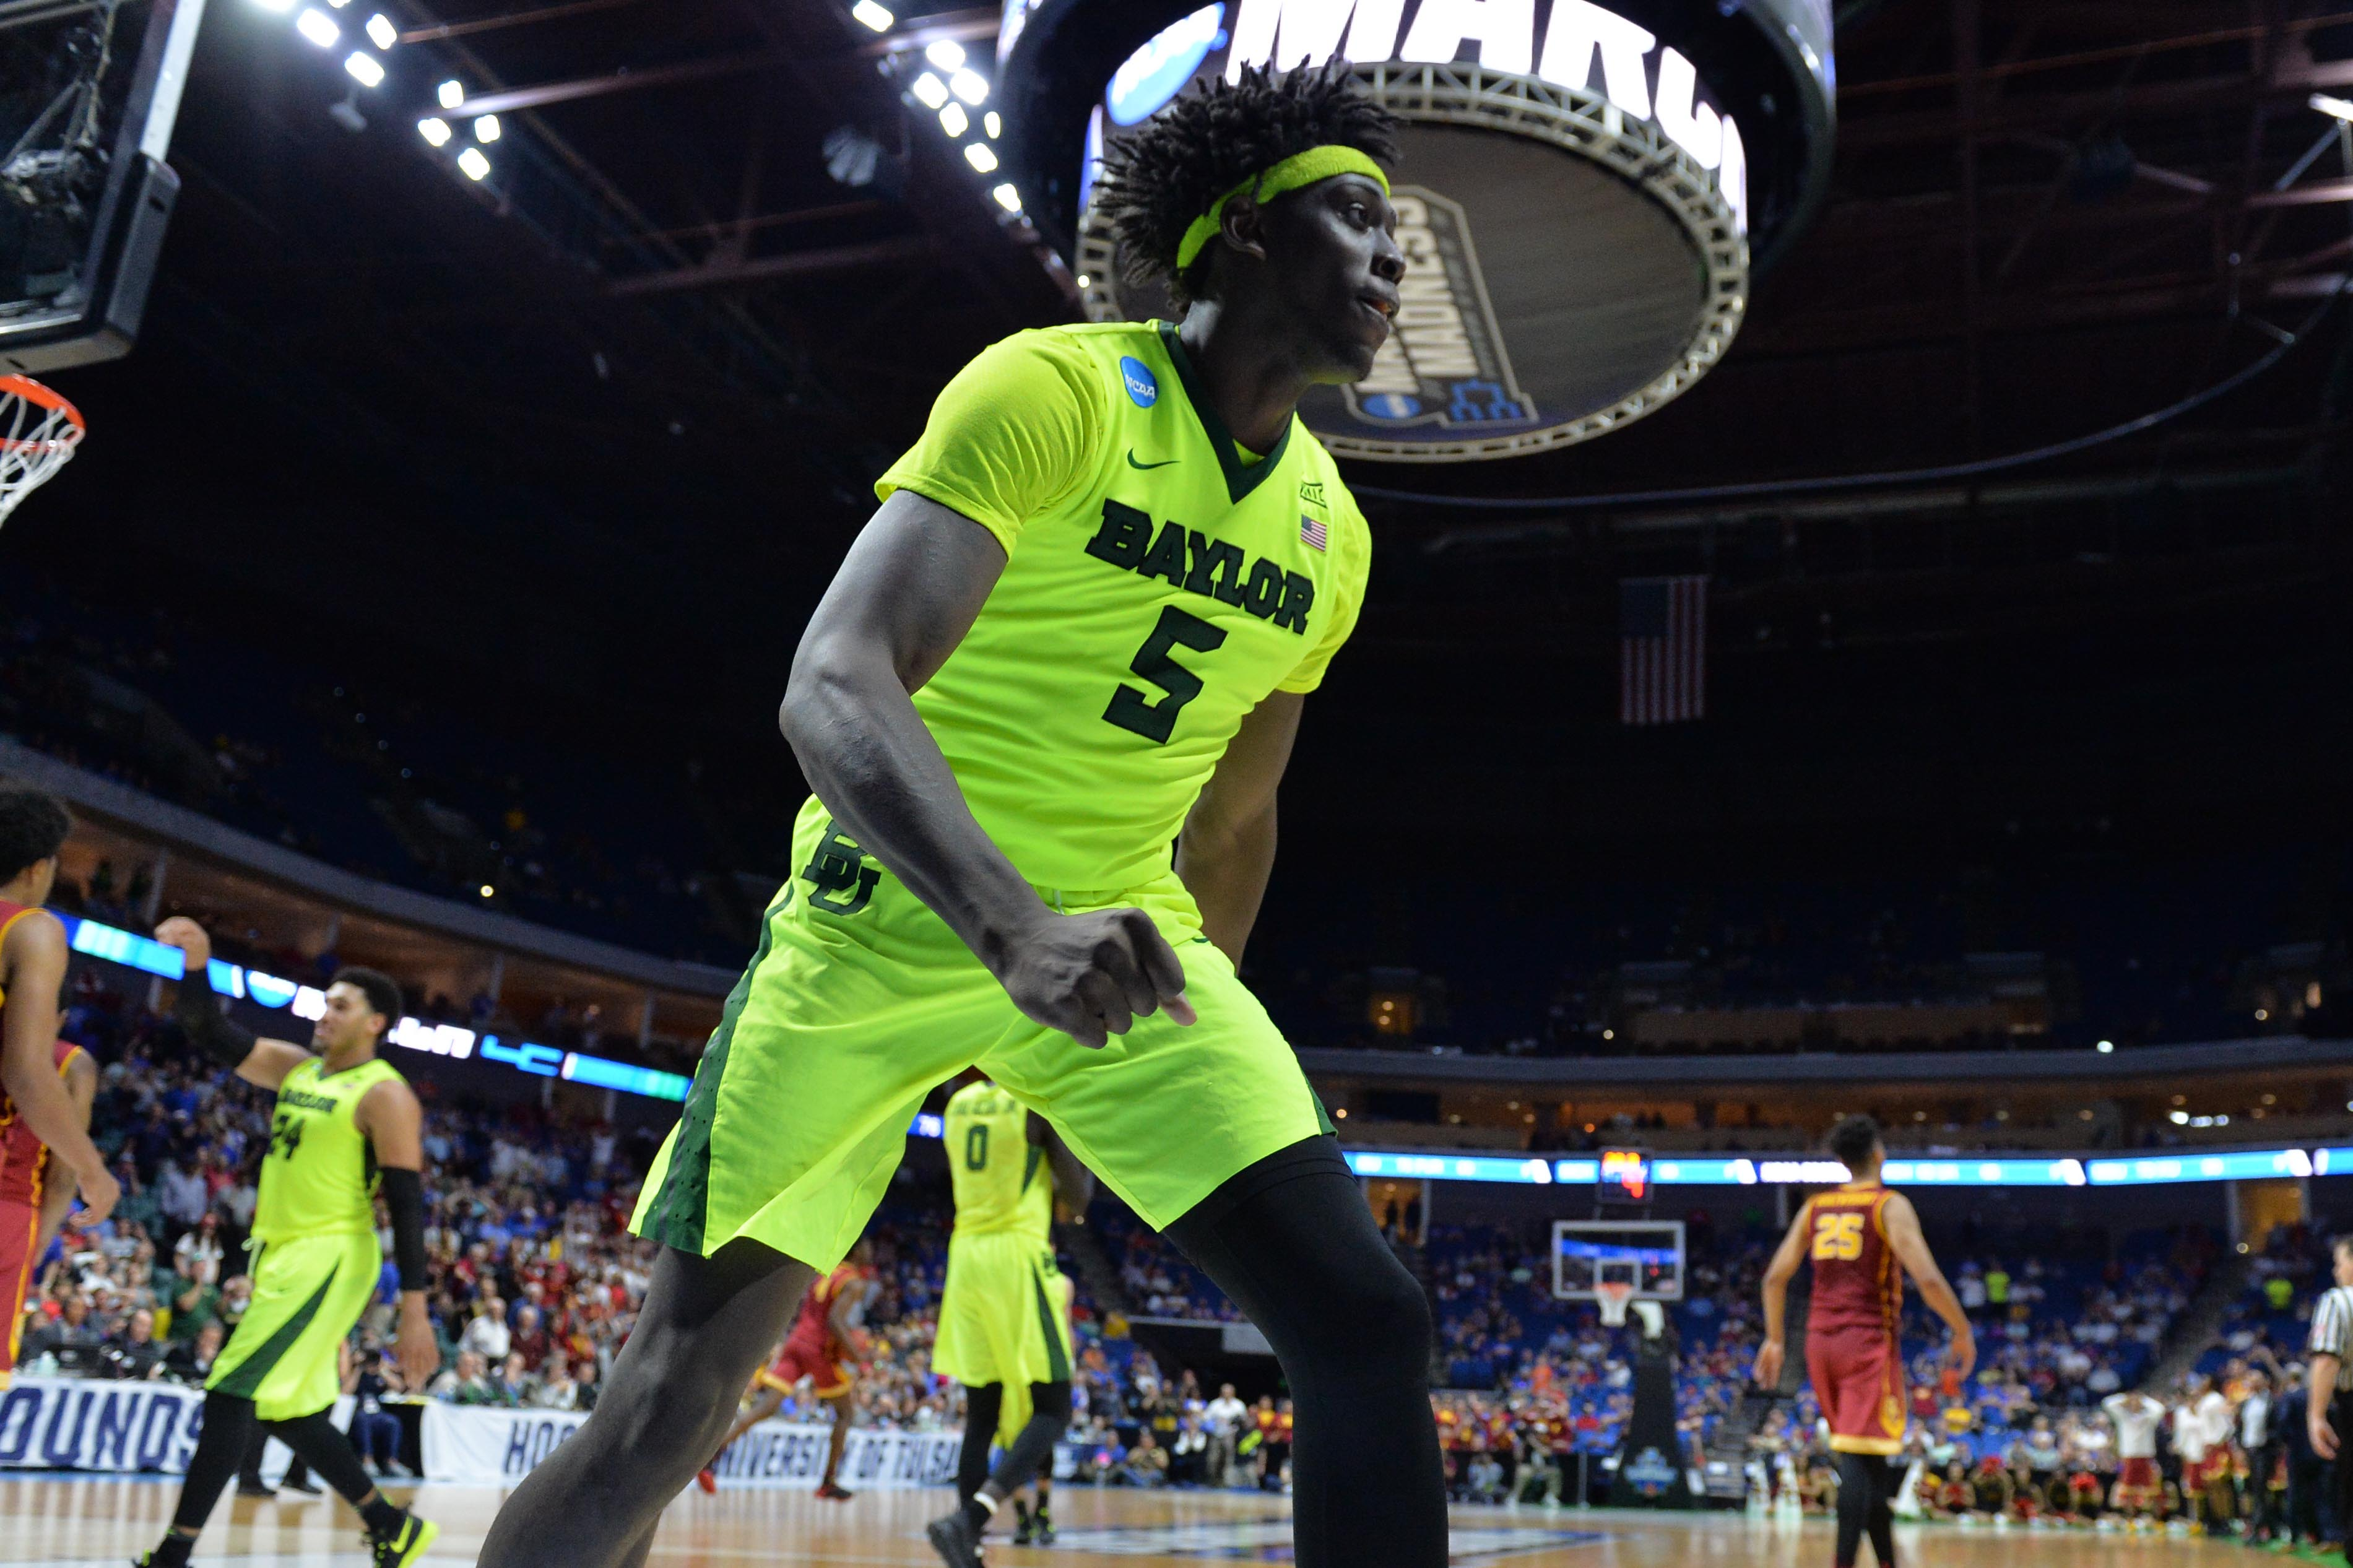 Baylor Basketball: Johnathan Motley Staying In 2017 NBA Draft